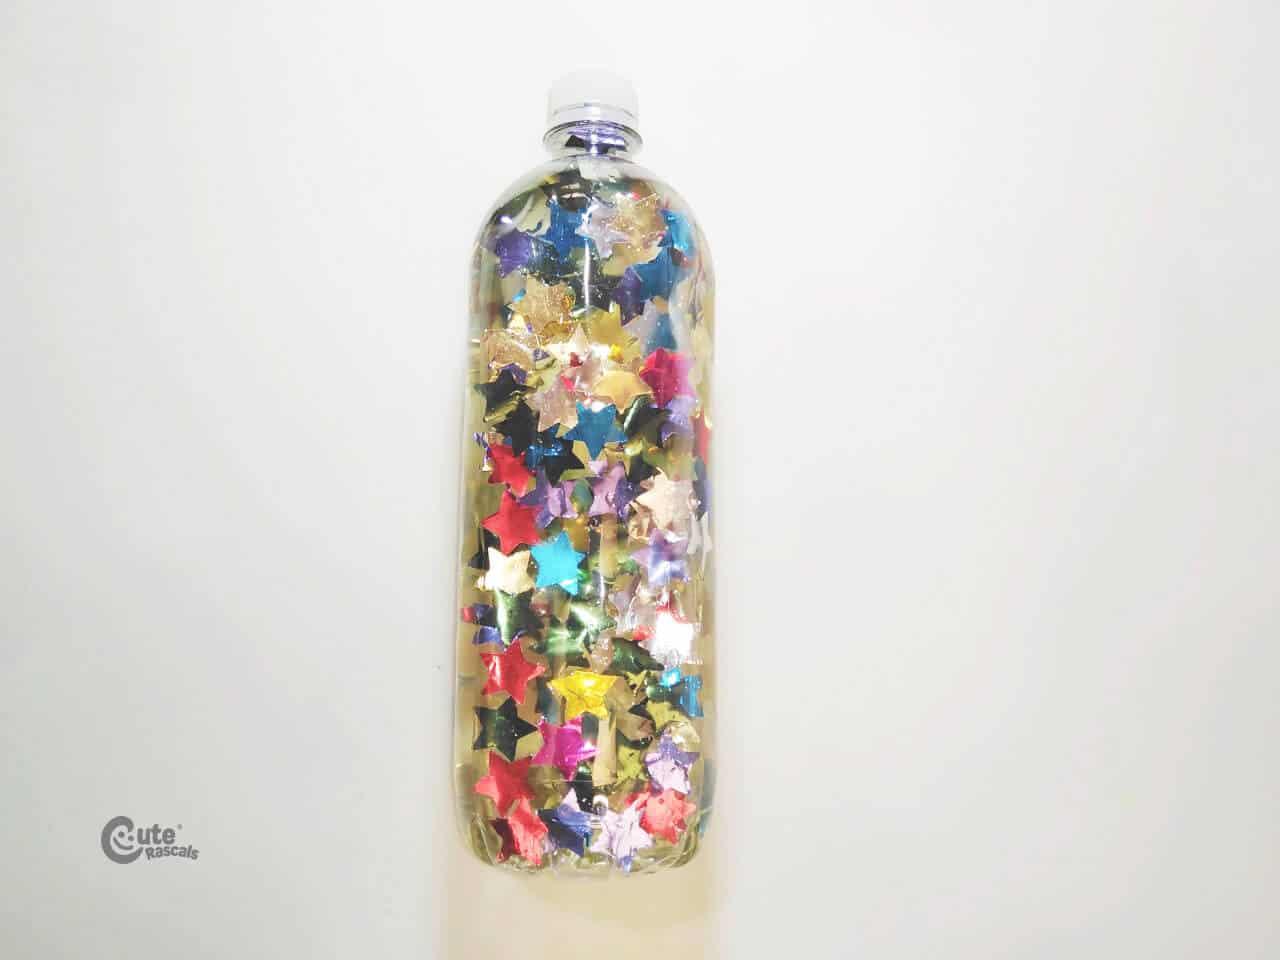 sensory bottle craft full of colors